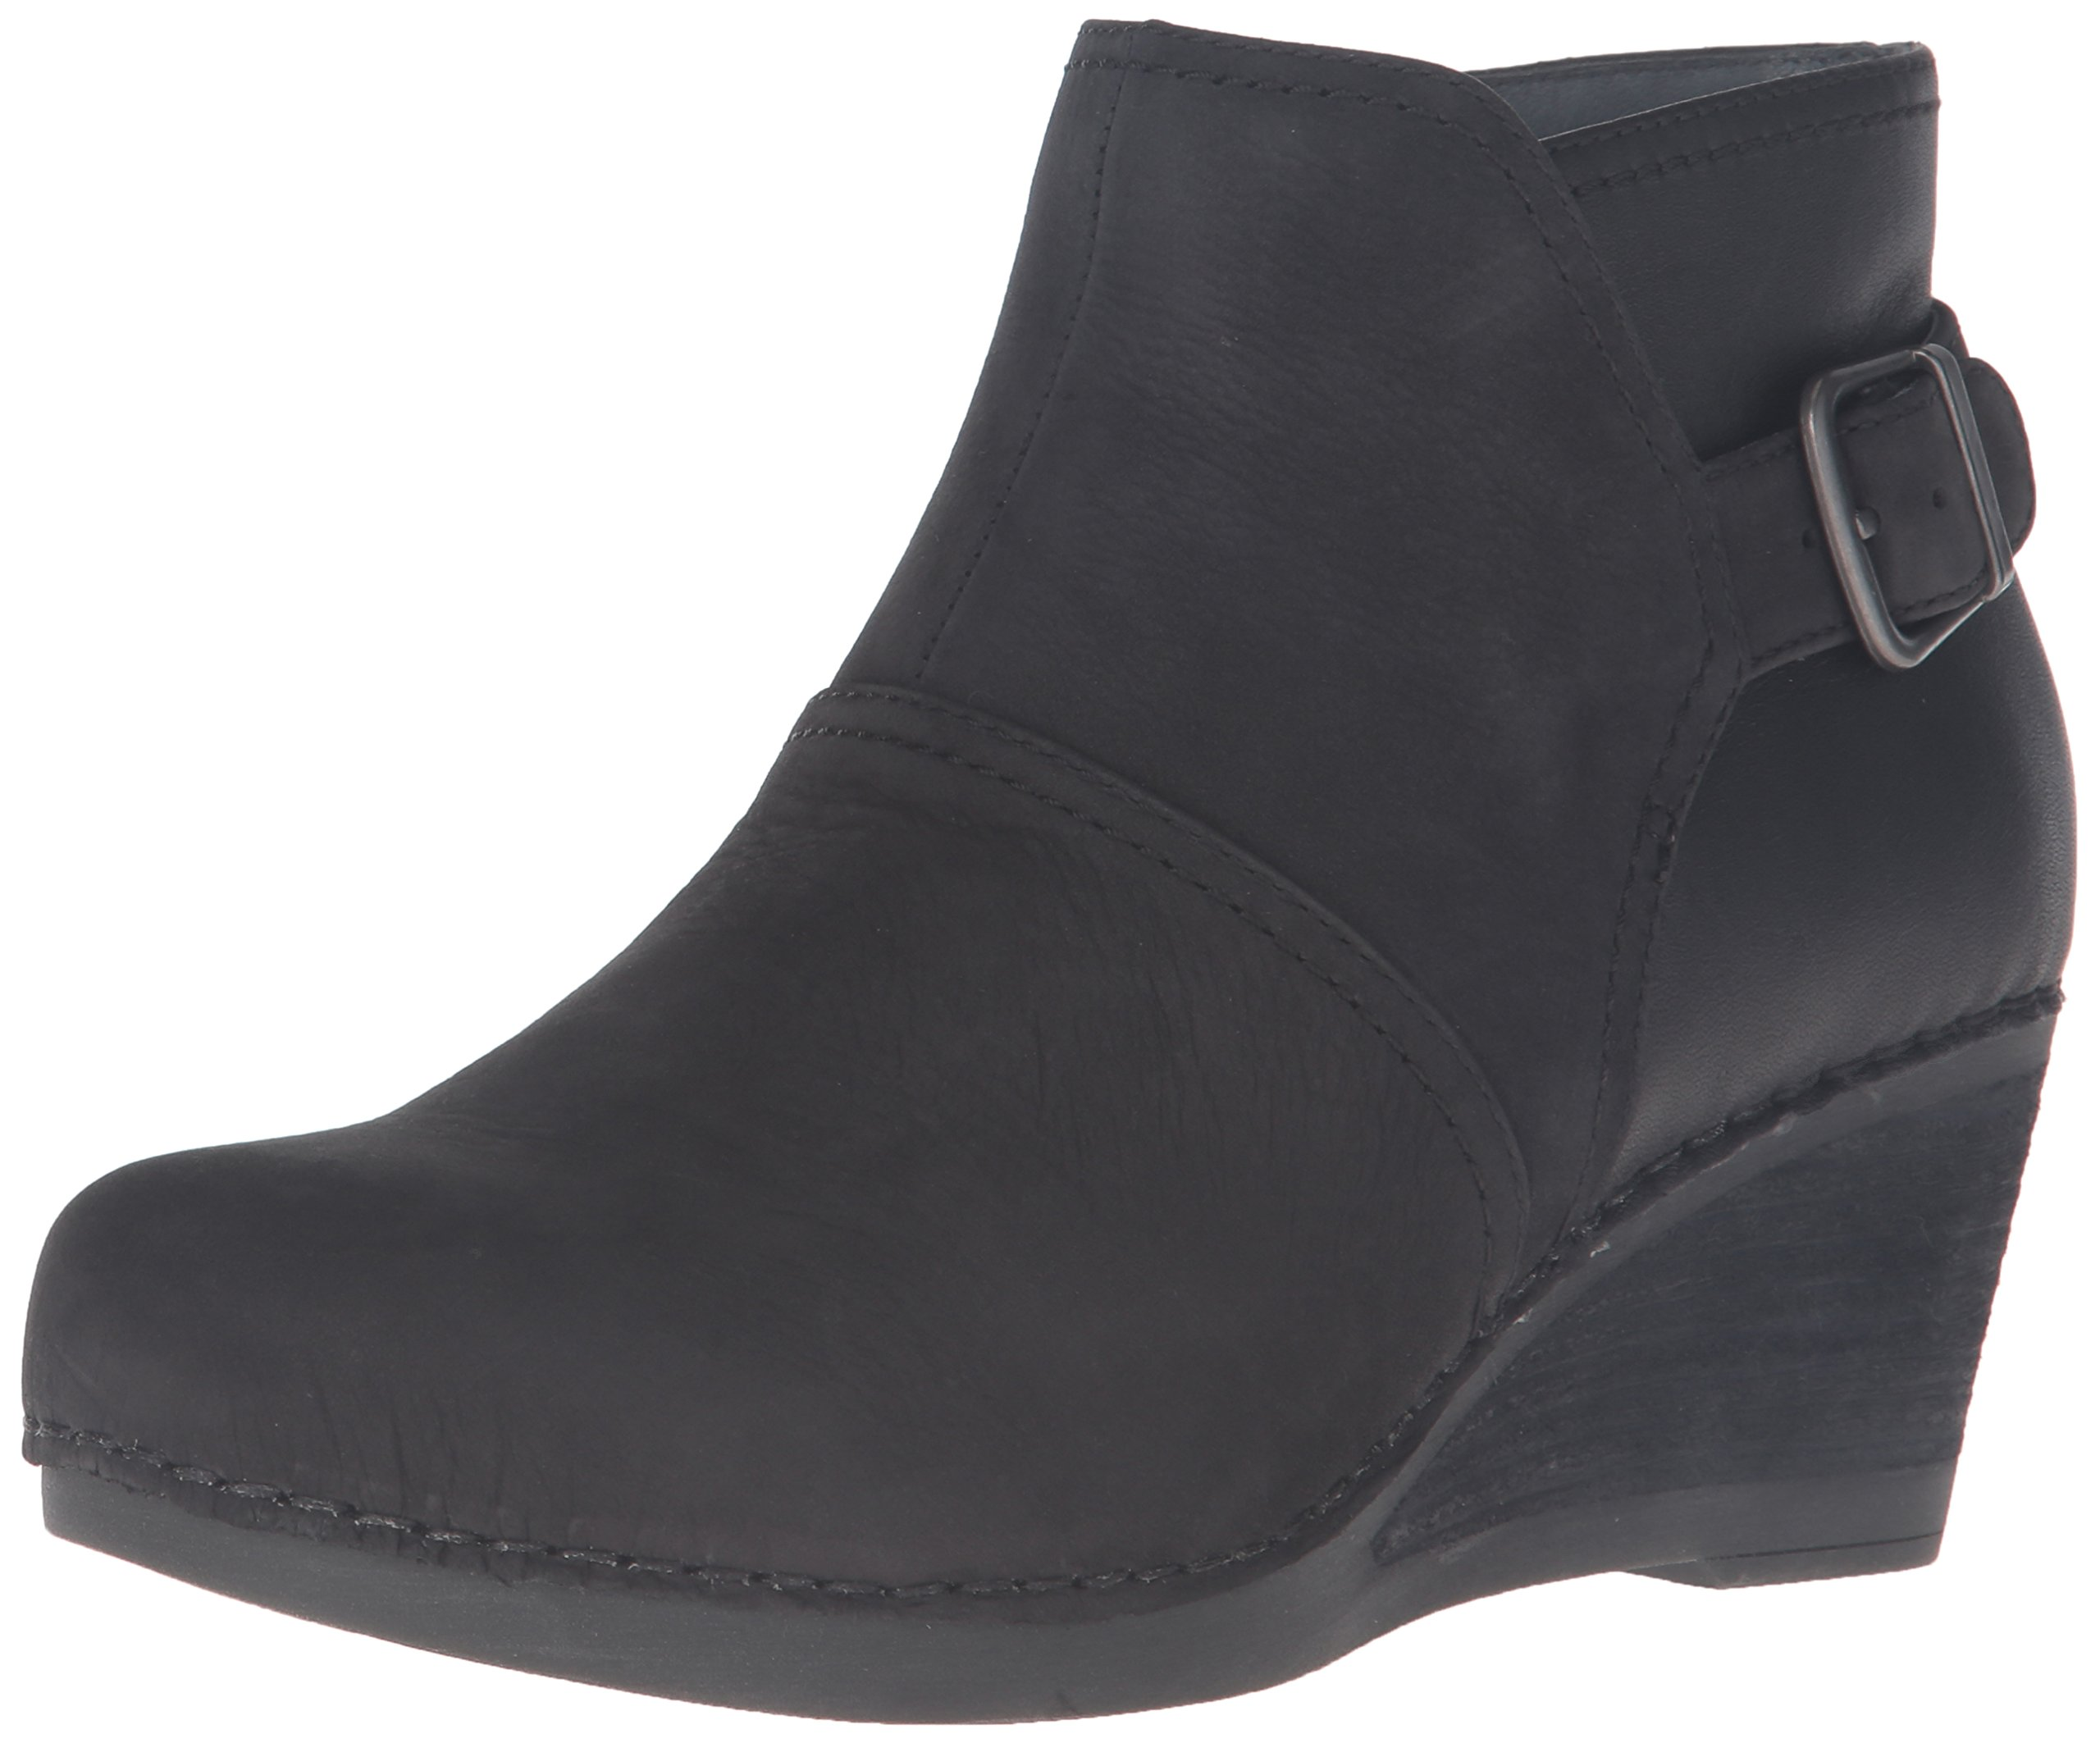 Dansko Women's Shirley Boot, Black Nubuck, 38 EU/7.5-8 M US